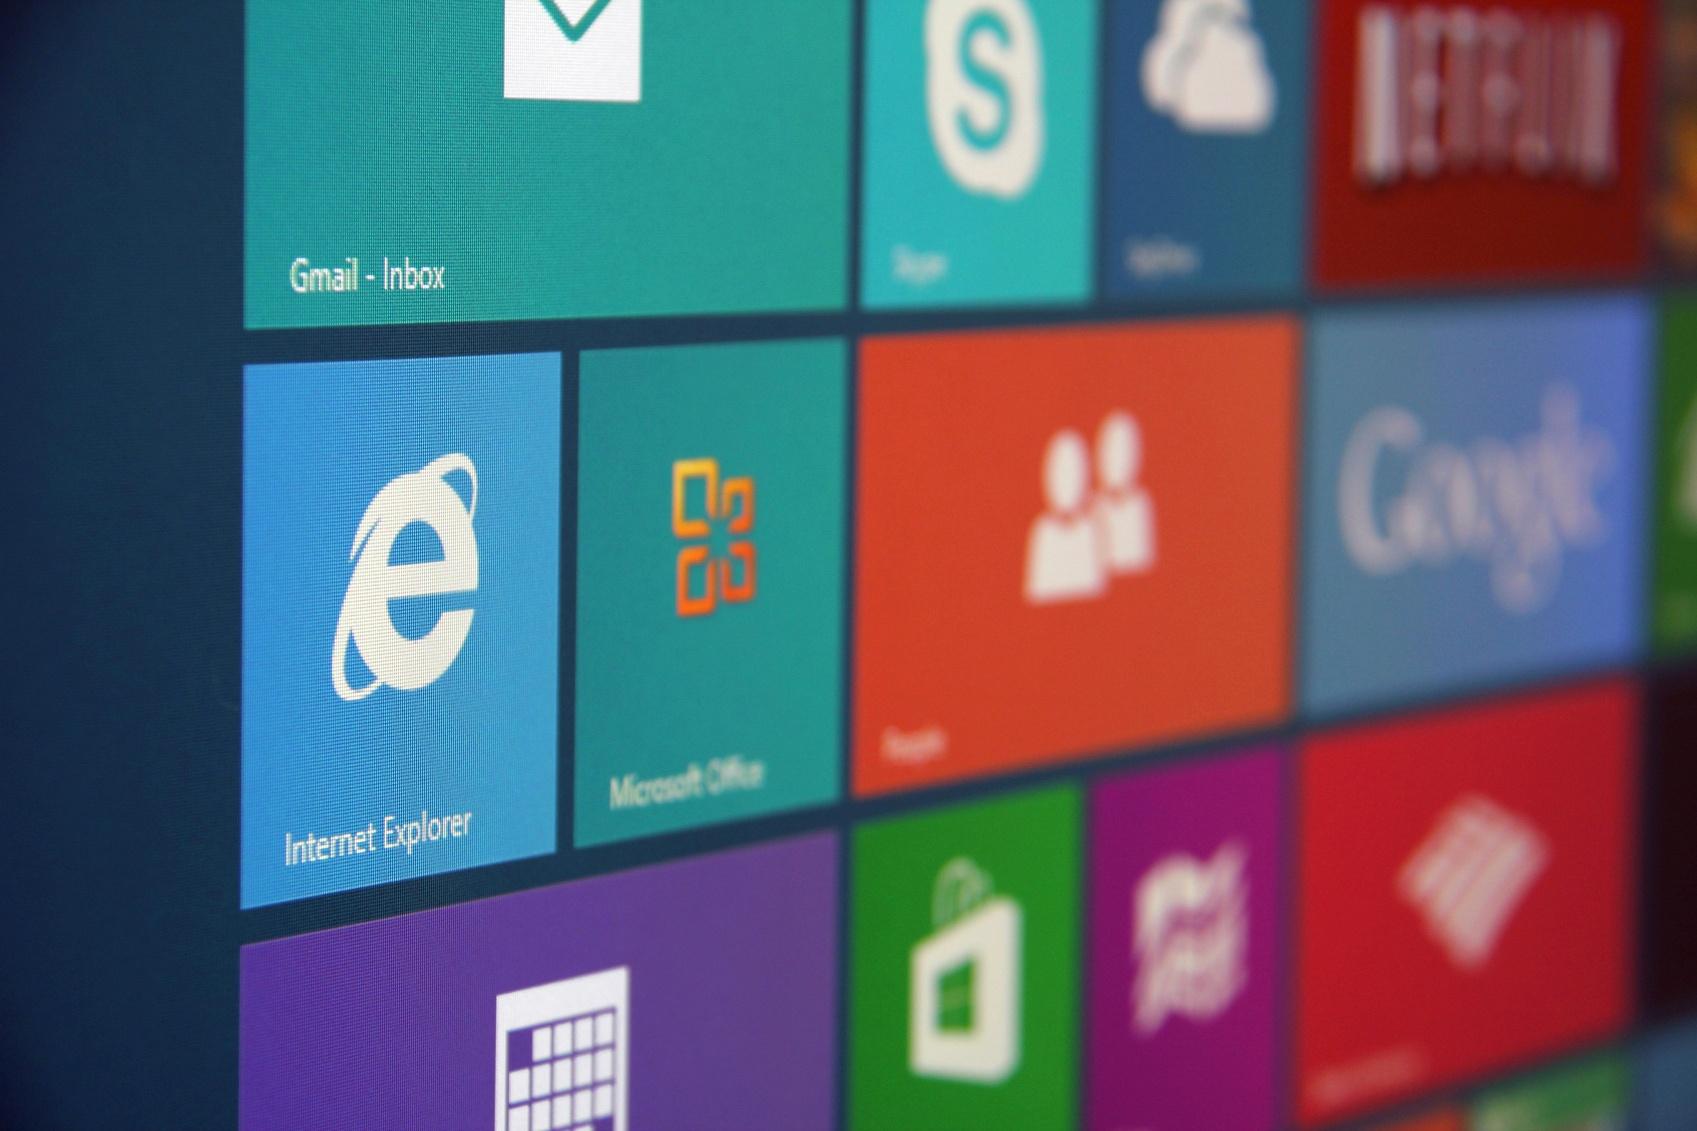 Windows-8-Start-000022239019_Medium.jpg